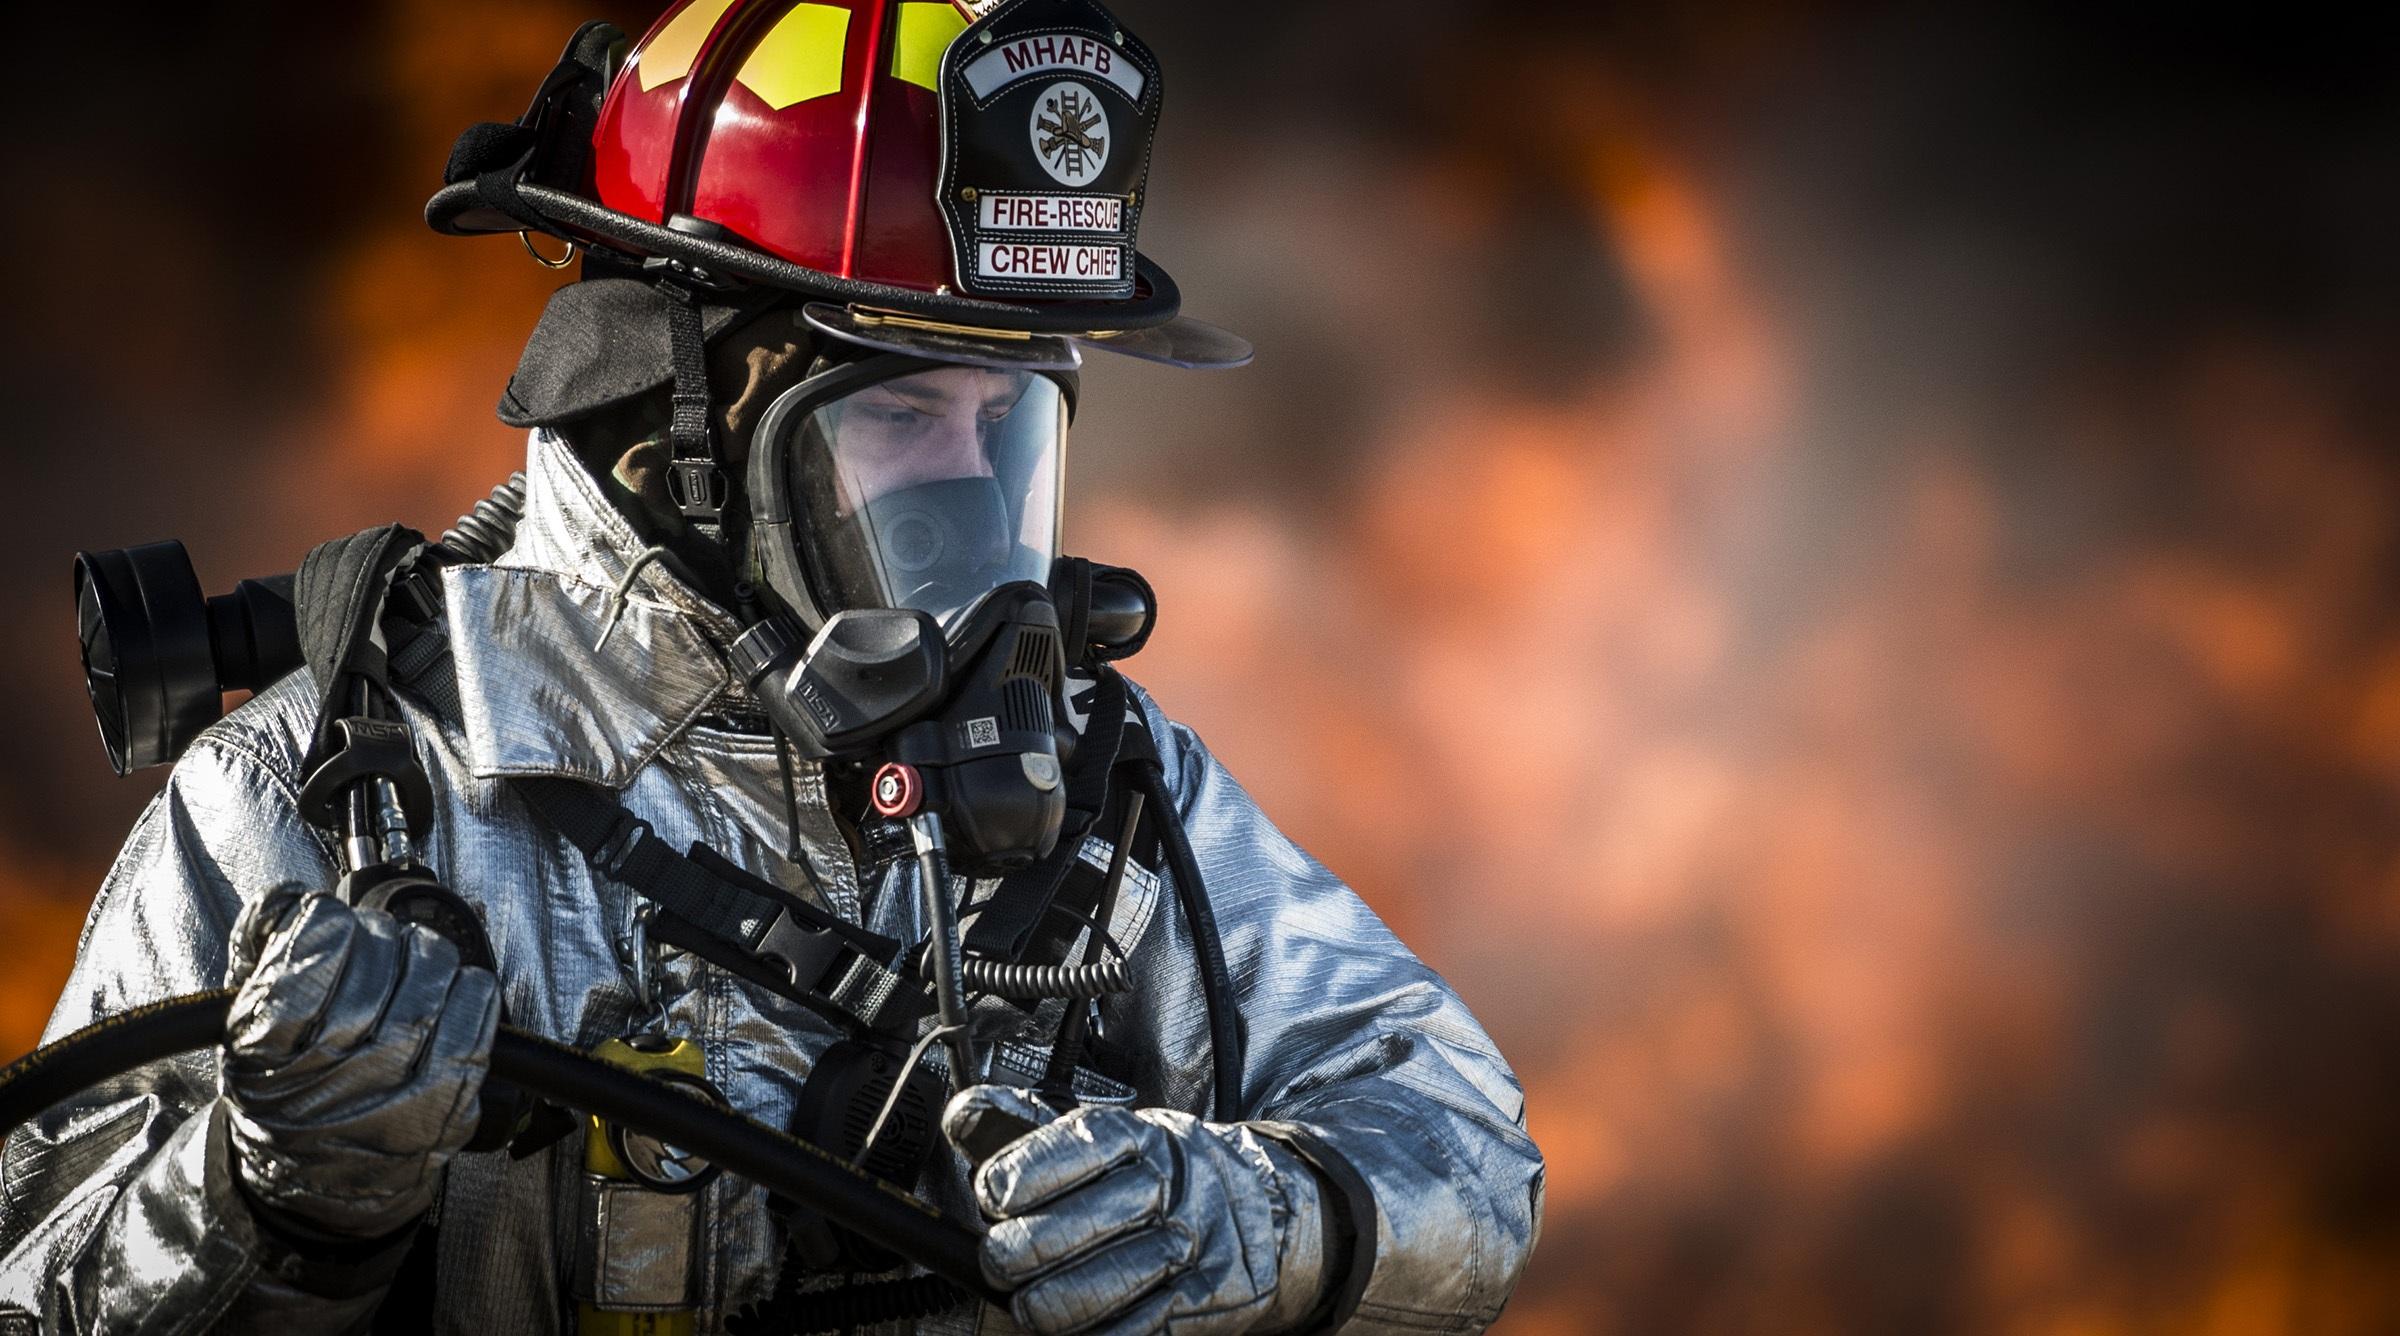 Firefighter: Man, Mask, Gas Mask, Helmet, Firefighter, Portrait